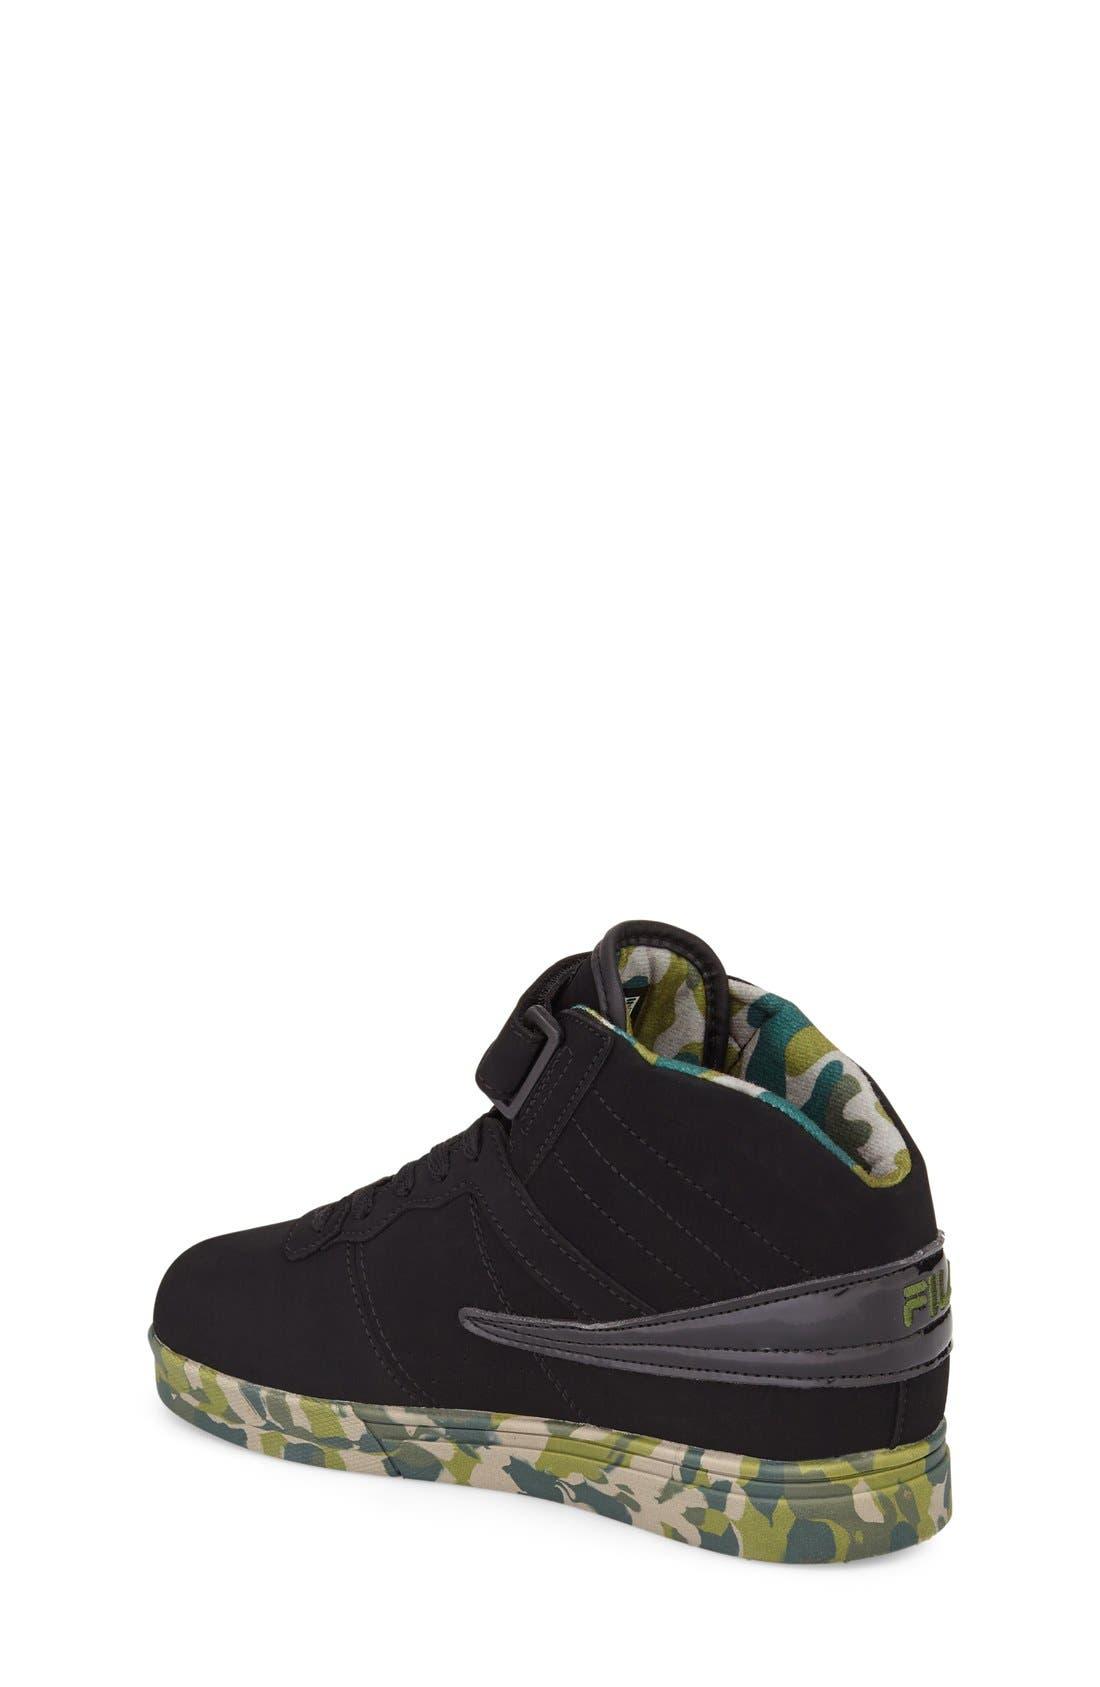 Alternate Image 2  - FILA Vulc 13 Mashup High Top Sneaker (Toddler, Little Kid & Big Kid)